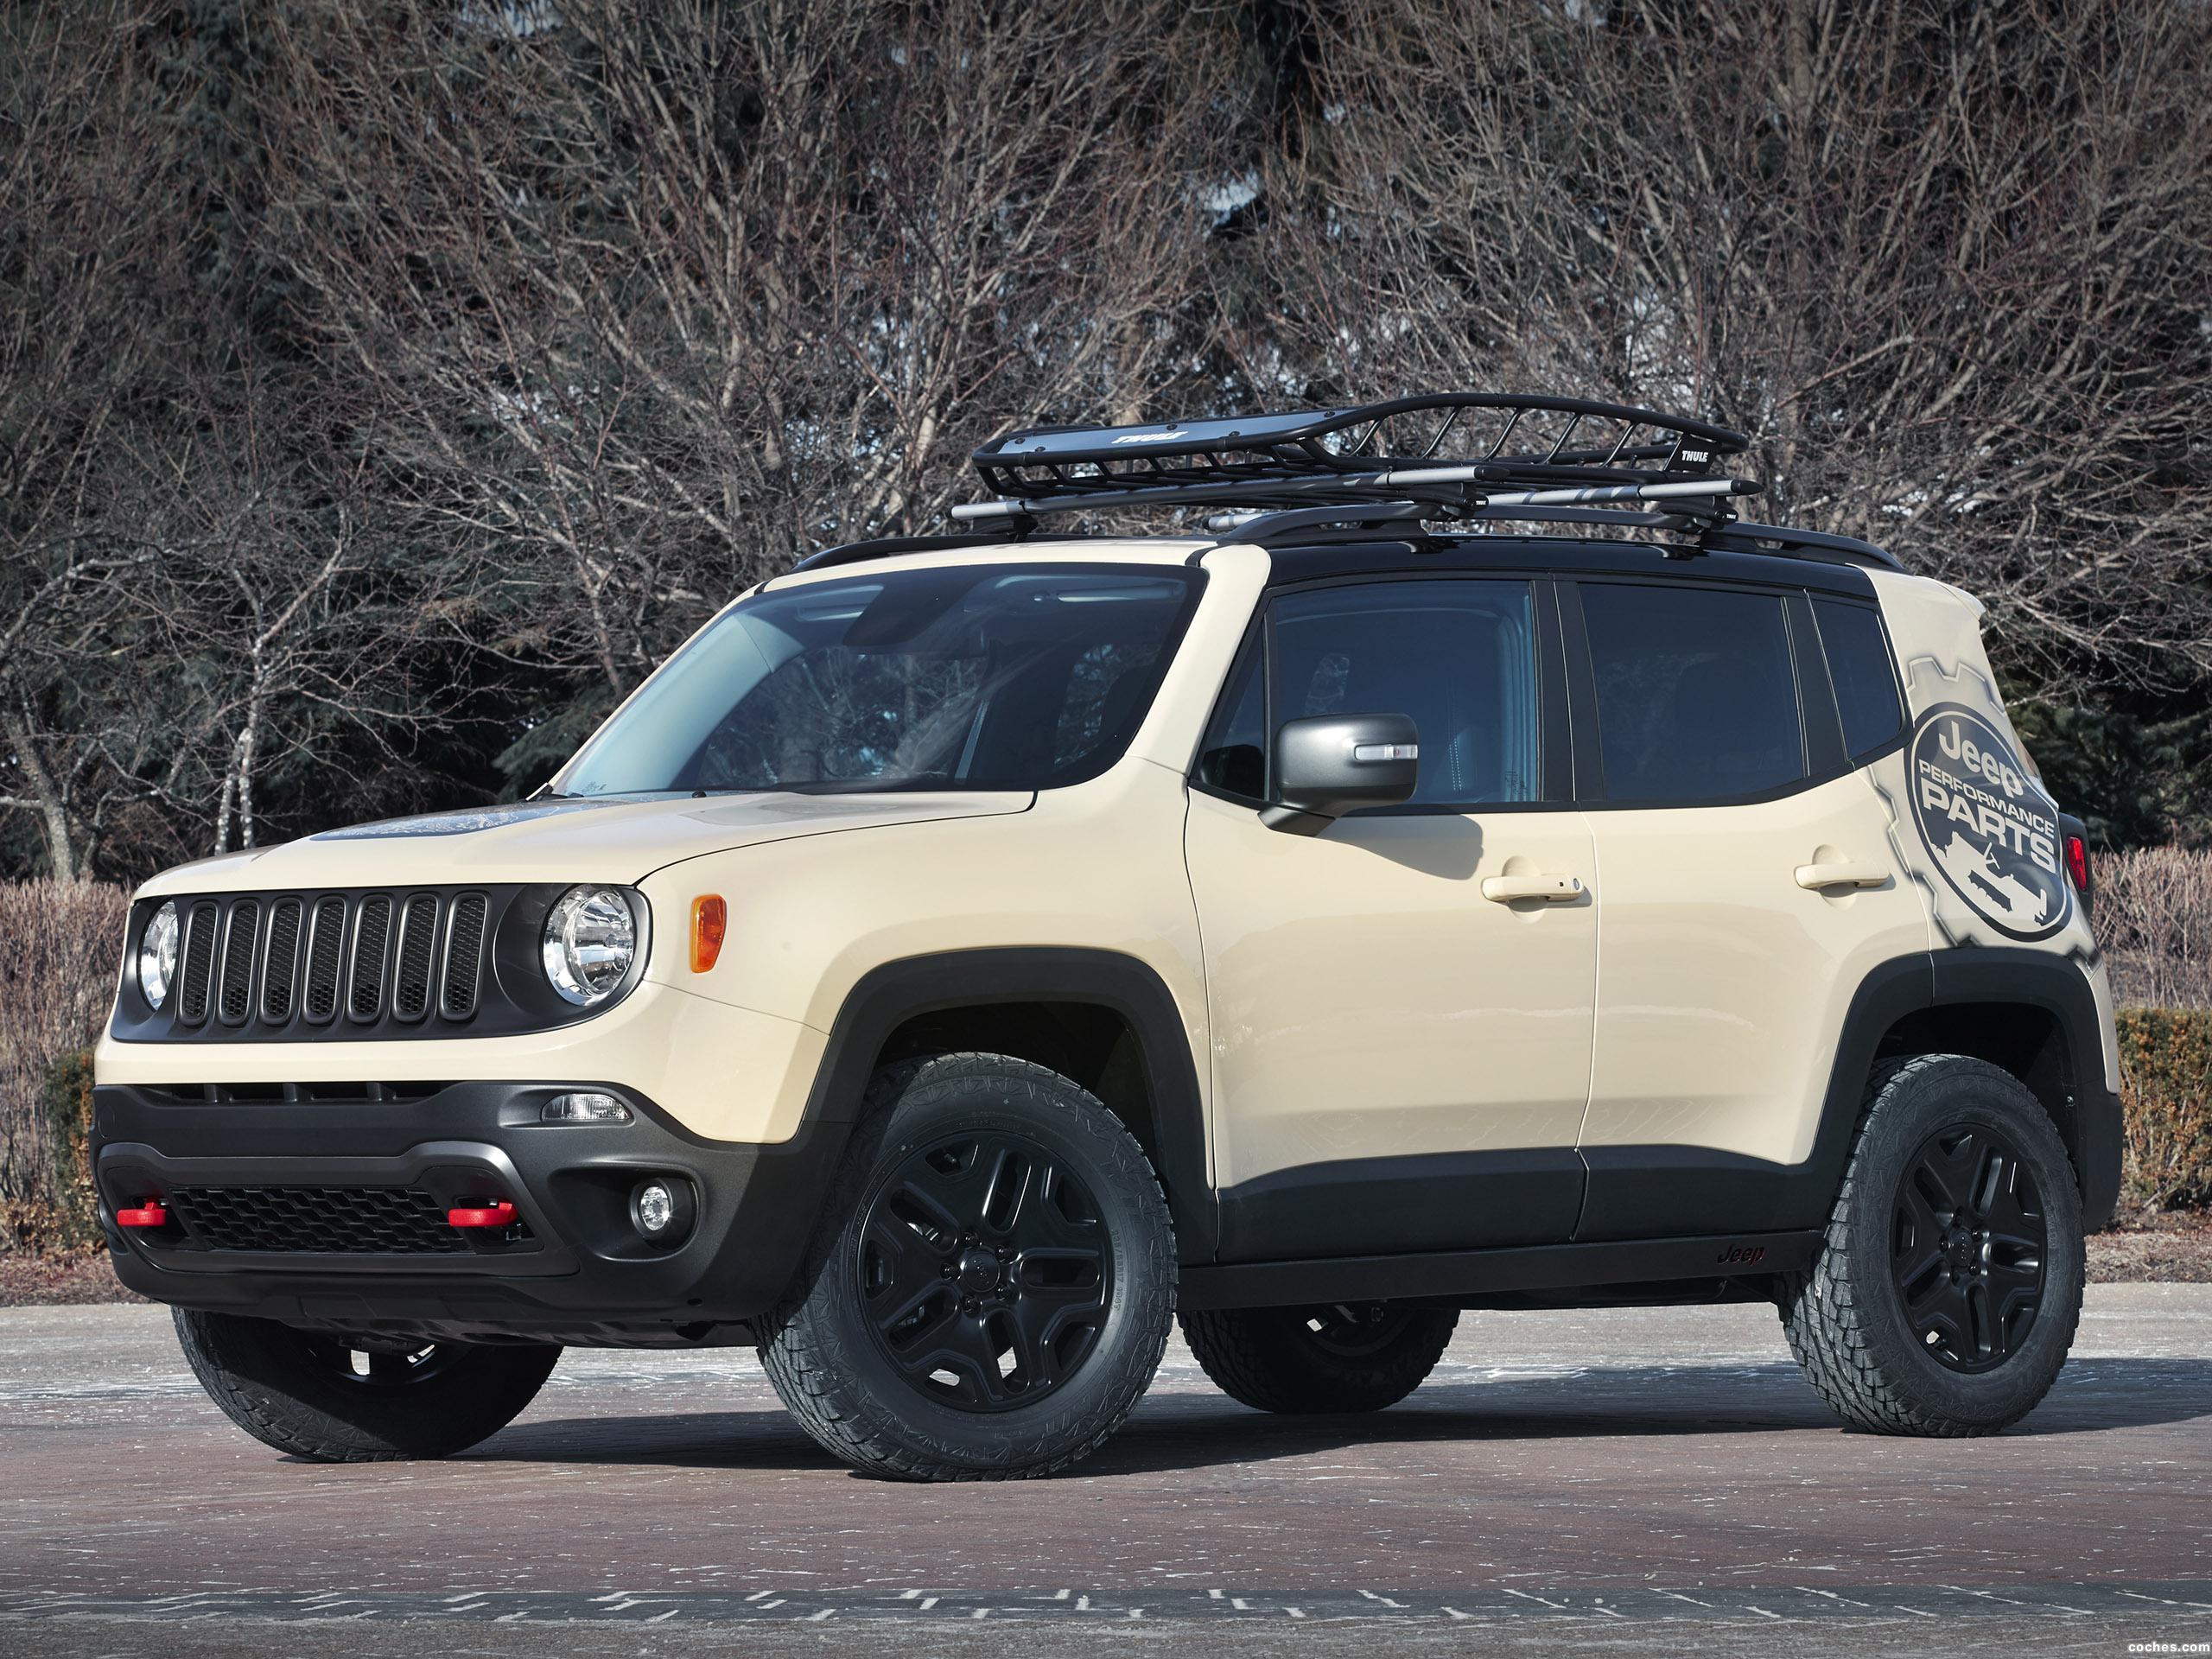 Jeep Renegade Desert Hawk >> Fotos de Jeep Renegade Desert Hawk Concept 2015